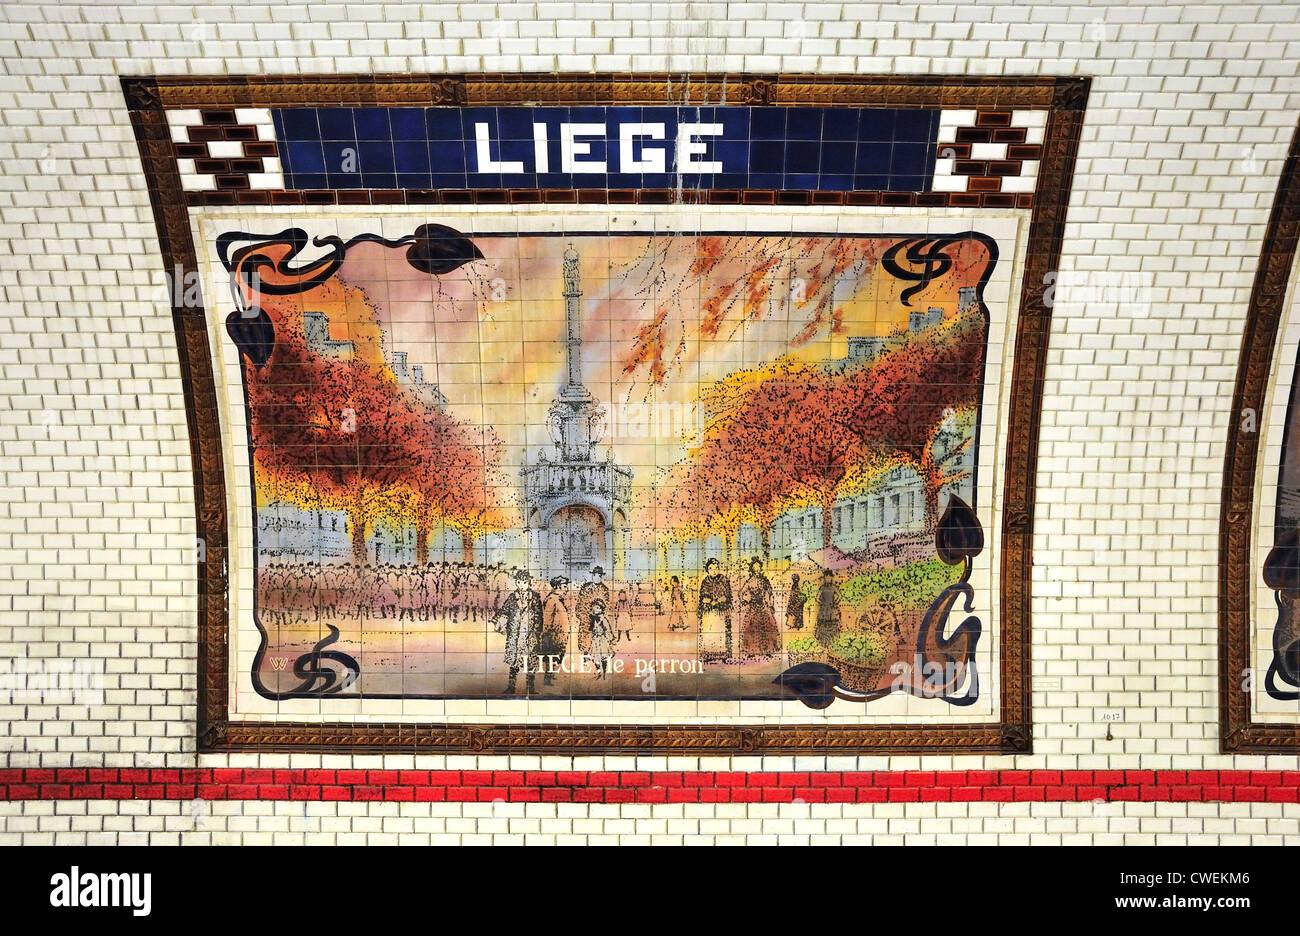 Liege Metro Station Metro Paris Stockfotos Liege Metro Station